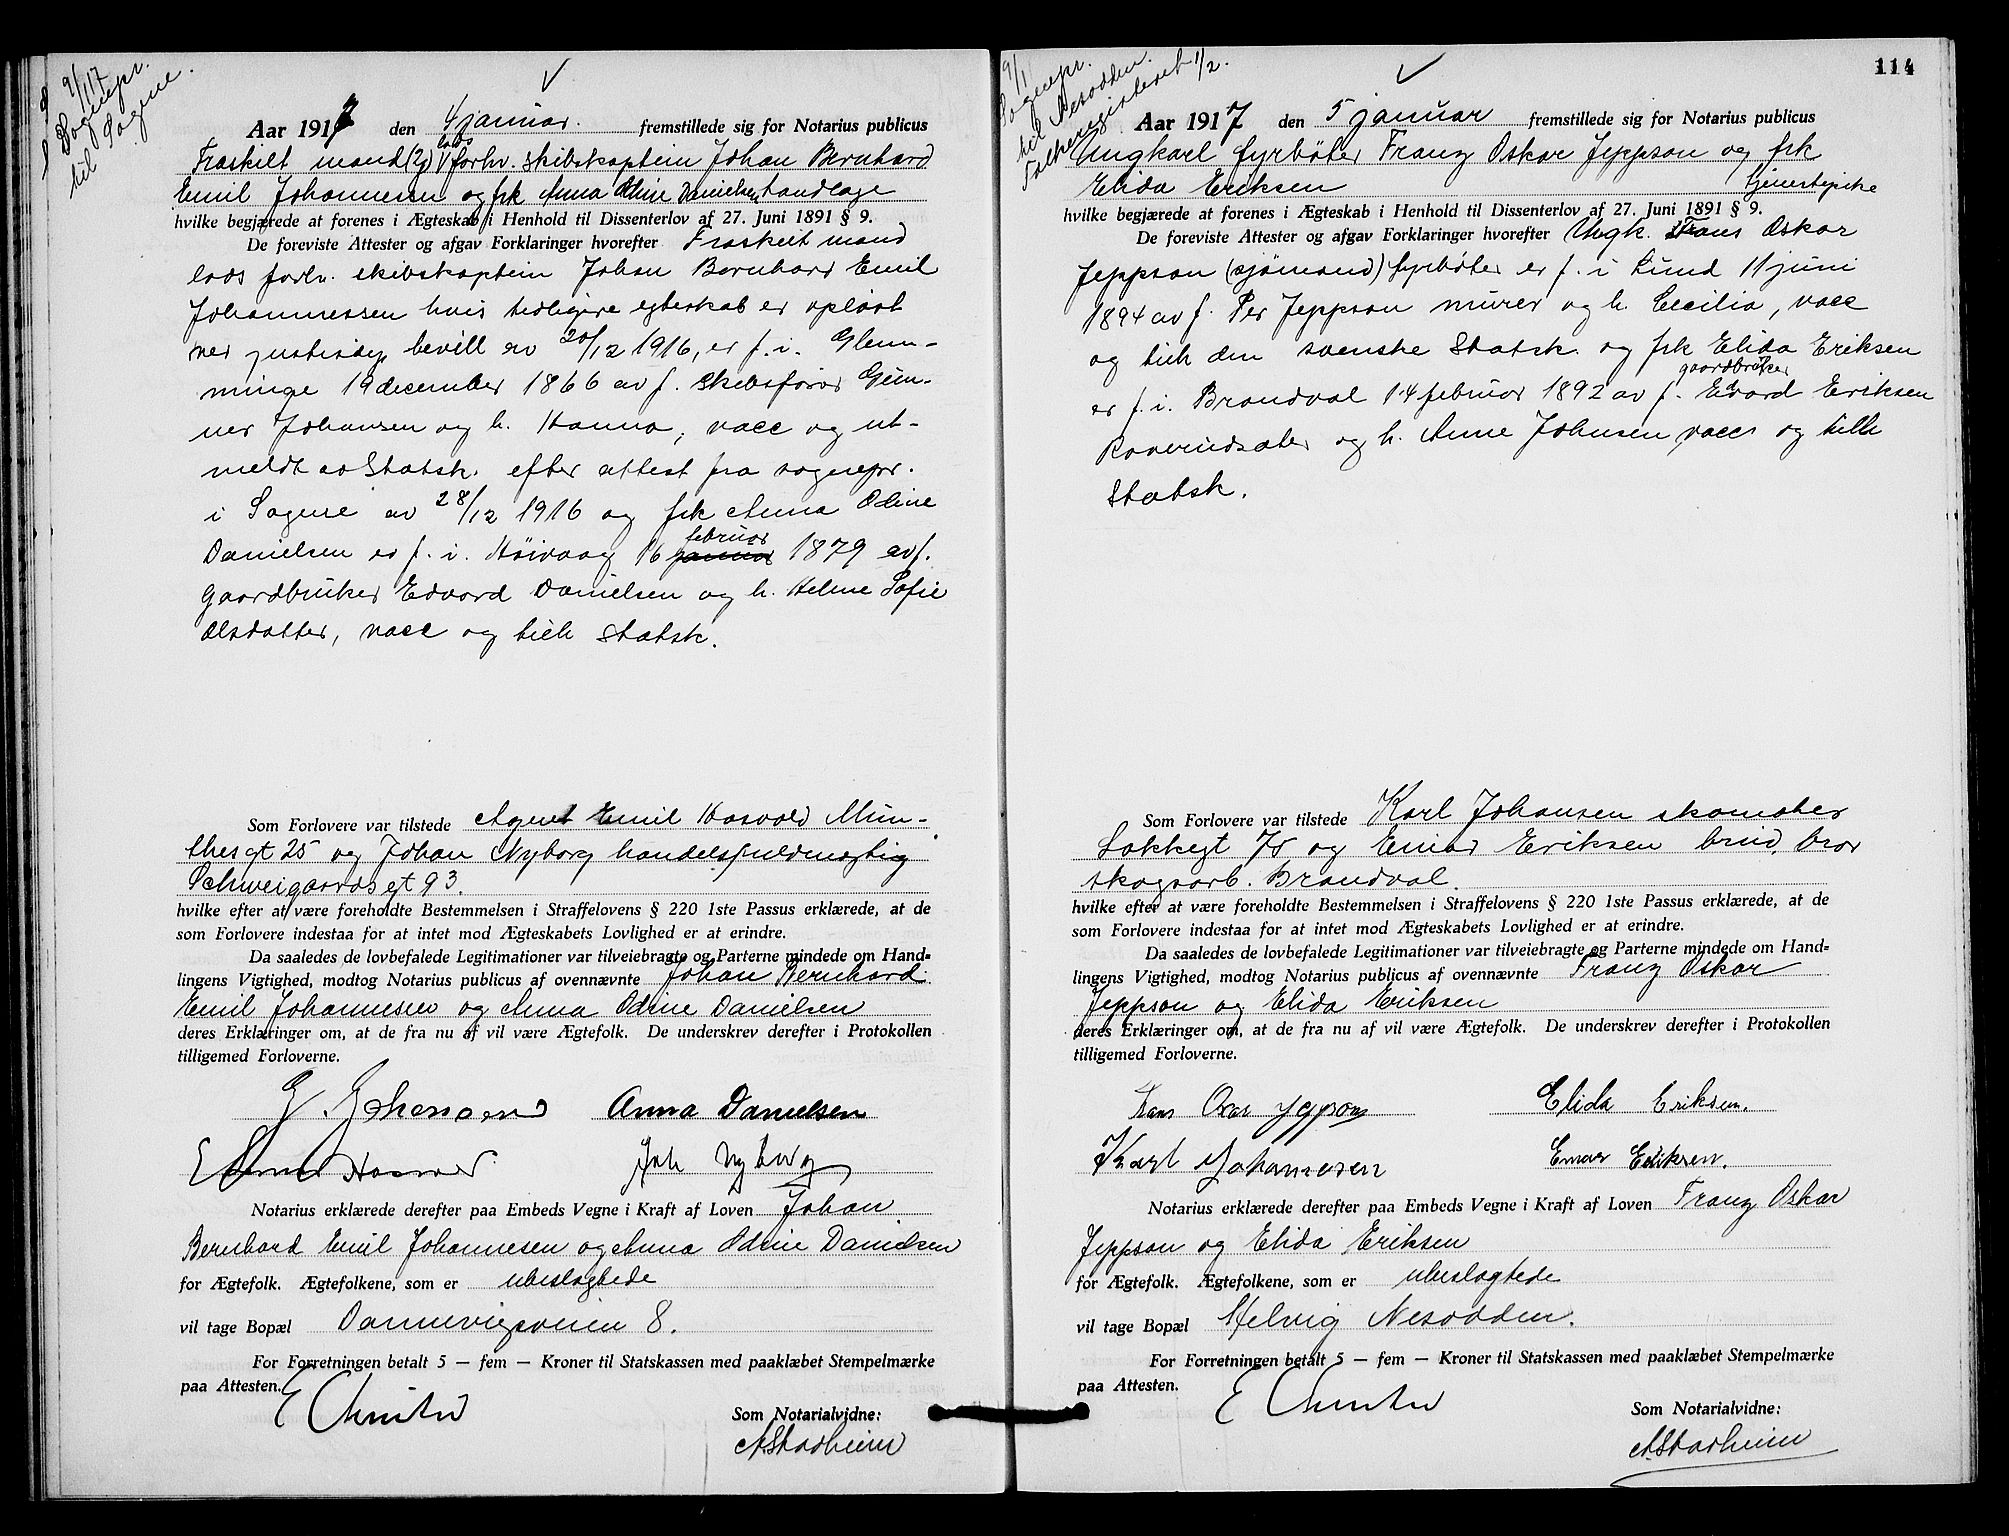 SAO, Oslo byfogd avd. I, L/Lb/Lbb/L0011: Notarialprotokoll, rekke II: Vigsler, 1916-1918, s. 113b-114a